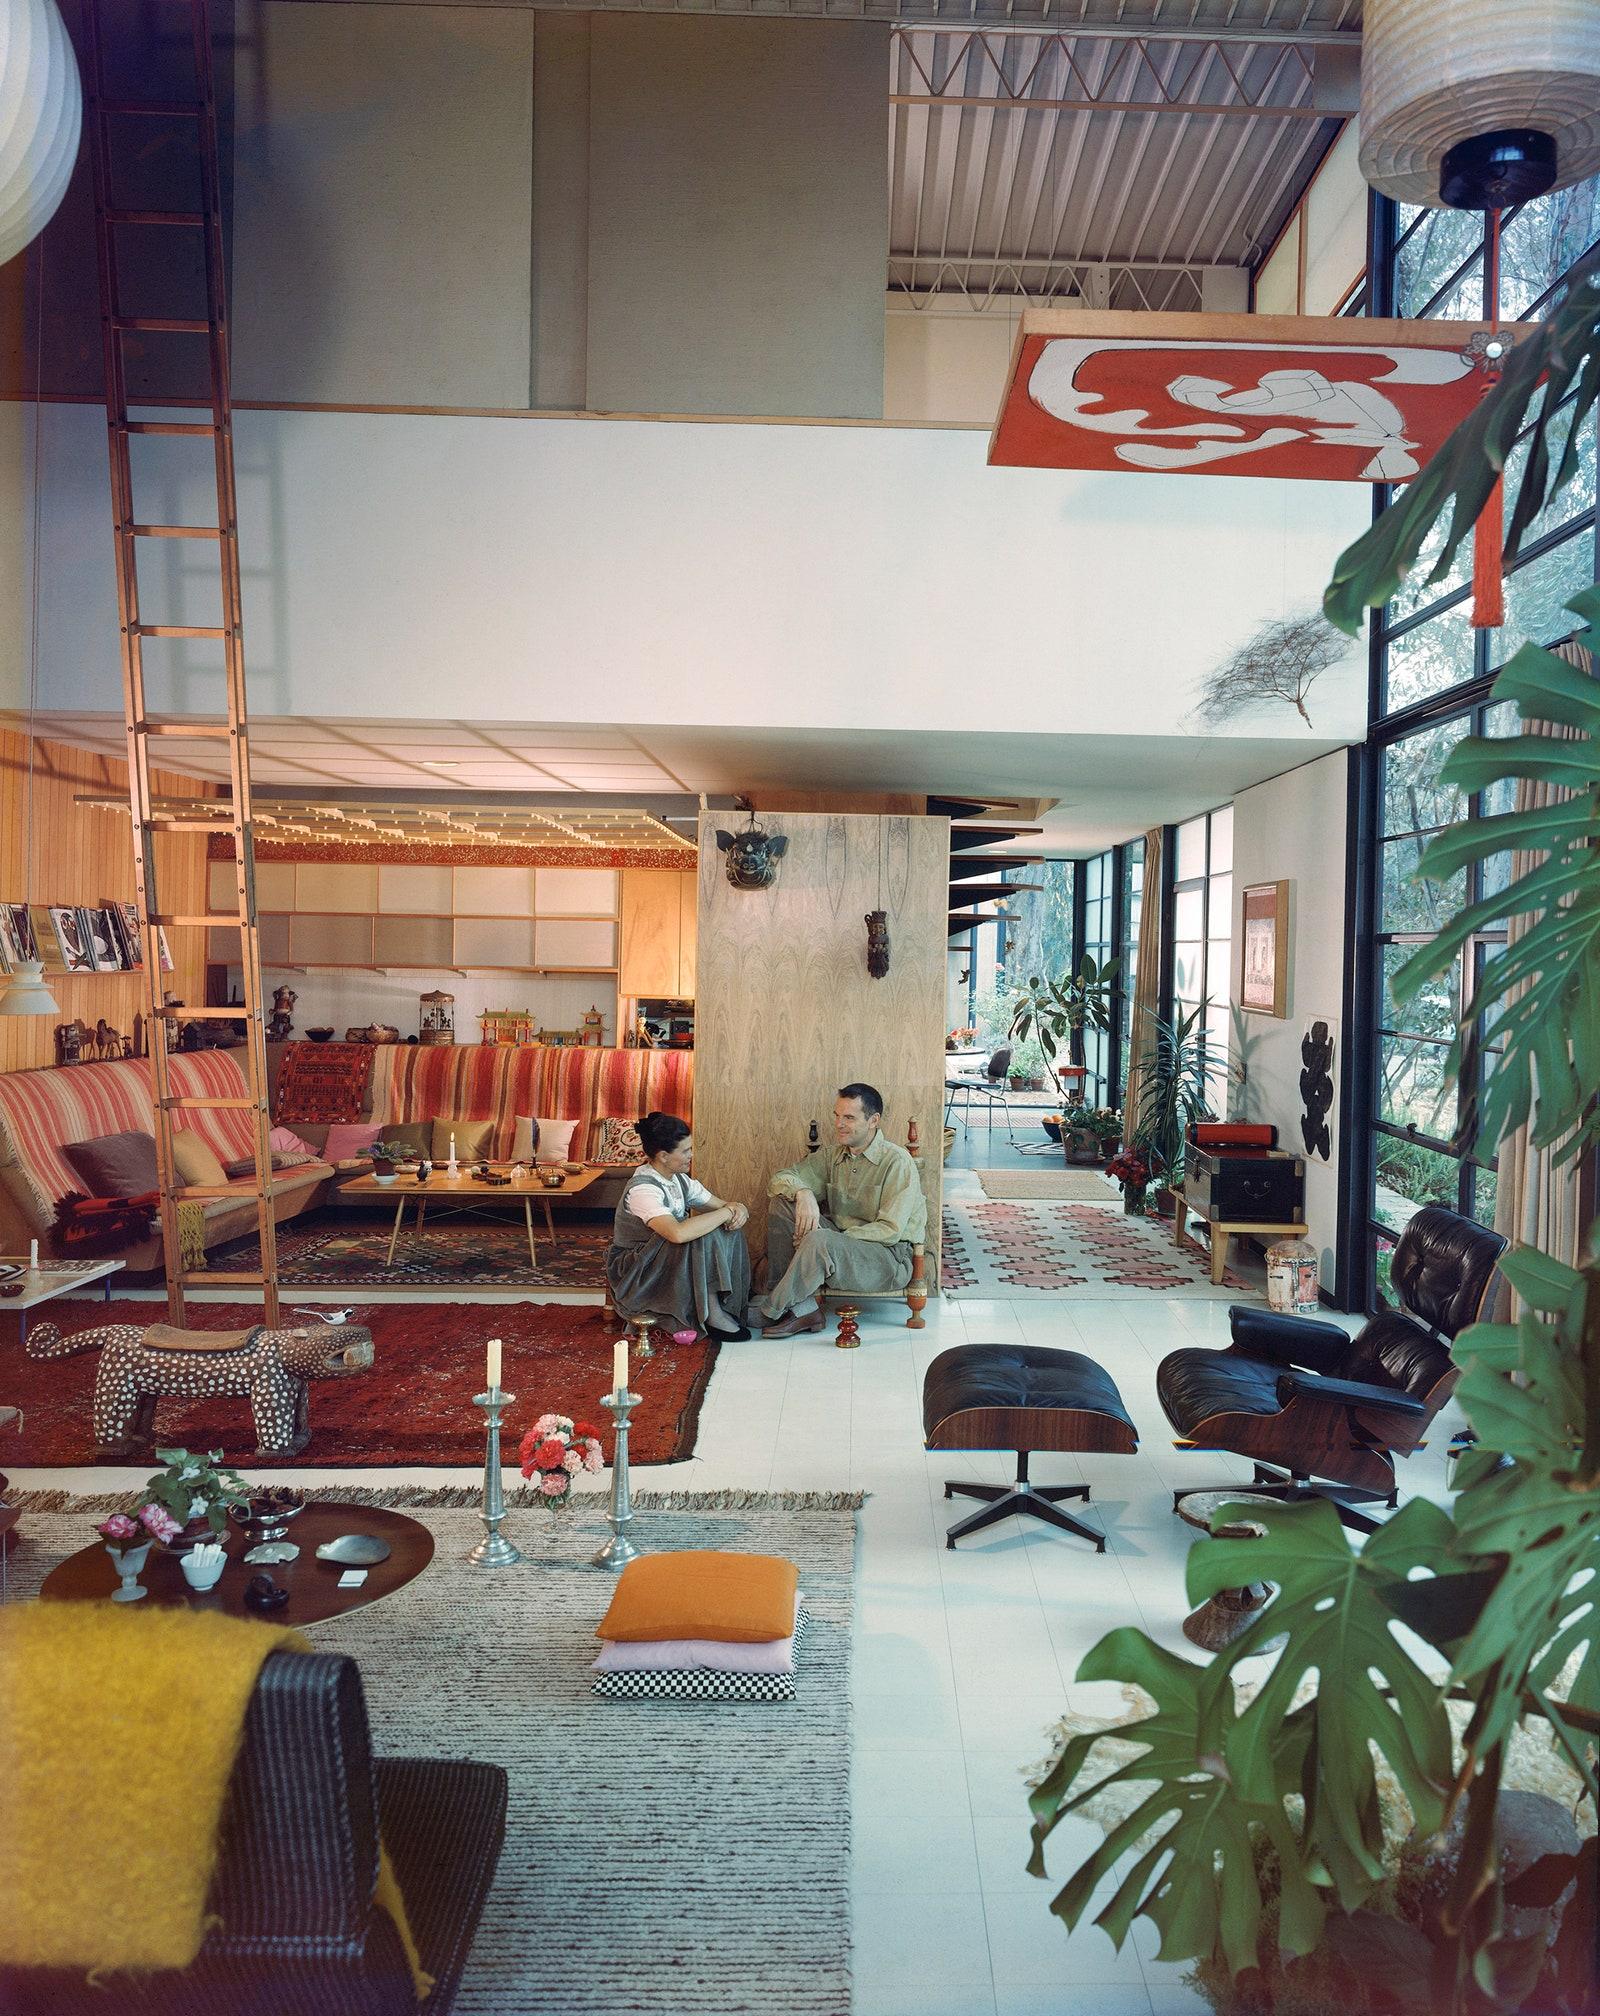 1958 .               .  Julius Shulman.  J. Paul Getty Trust. Getty Research Institute Los Angeles.